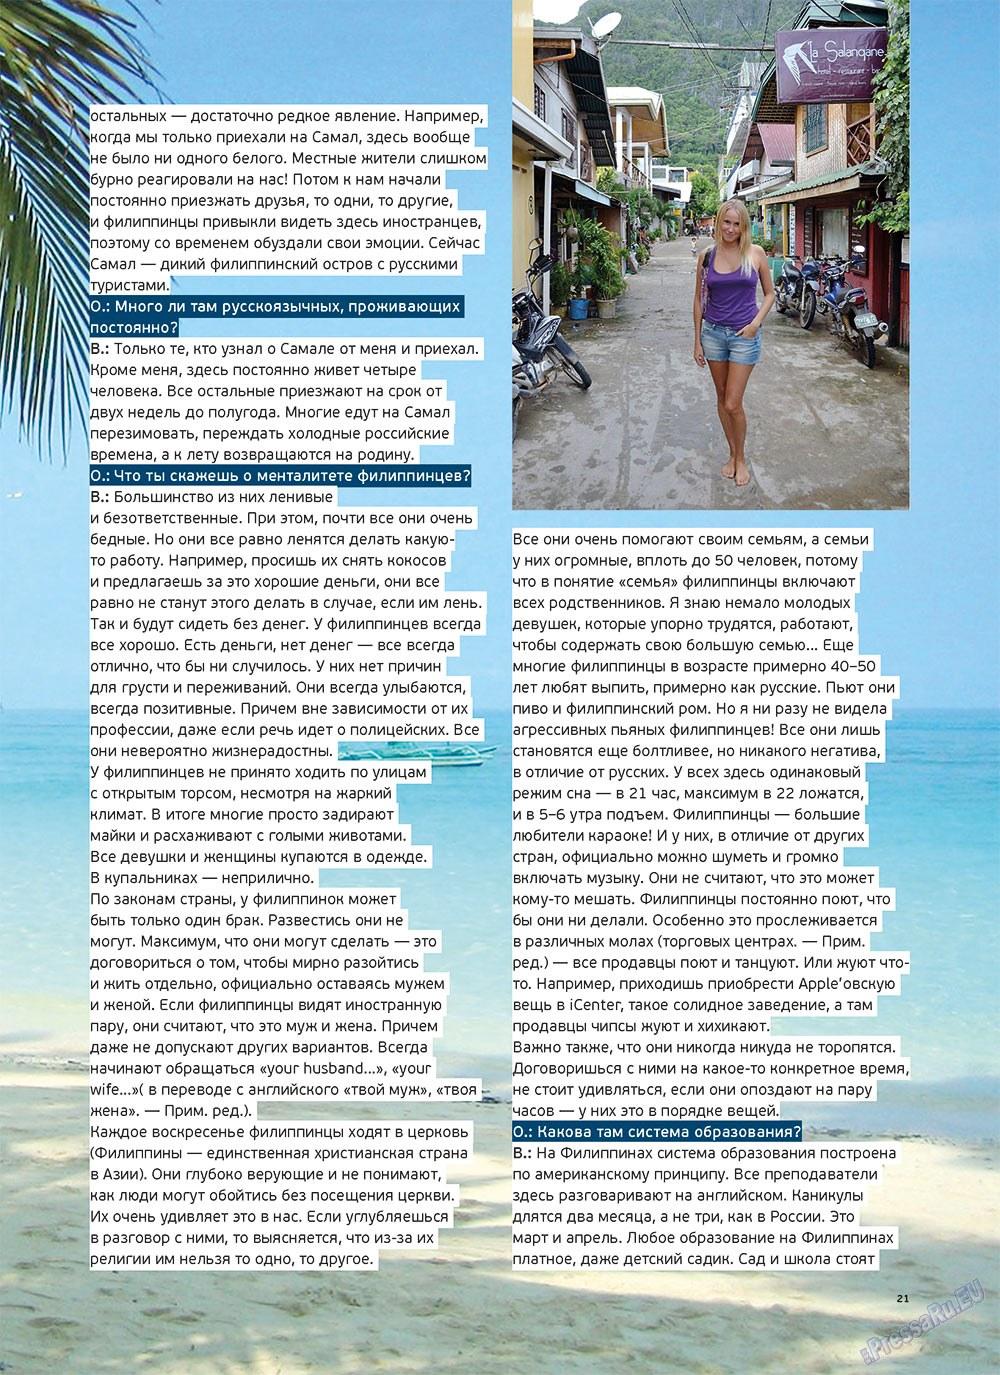 Артек (журнал). 2012 год, номер 5, стр. 23